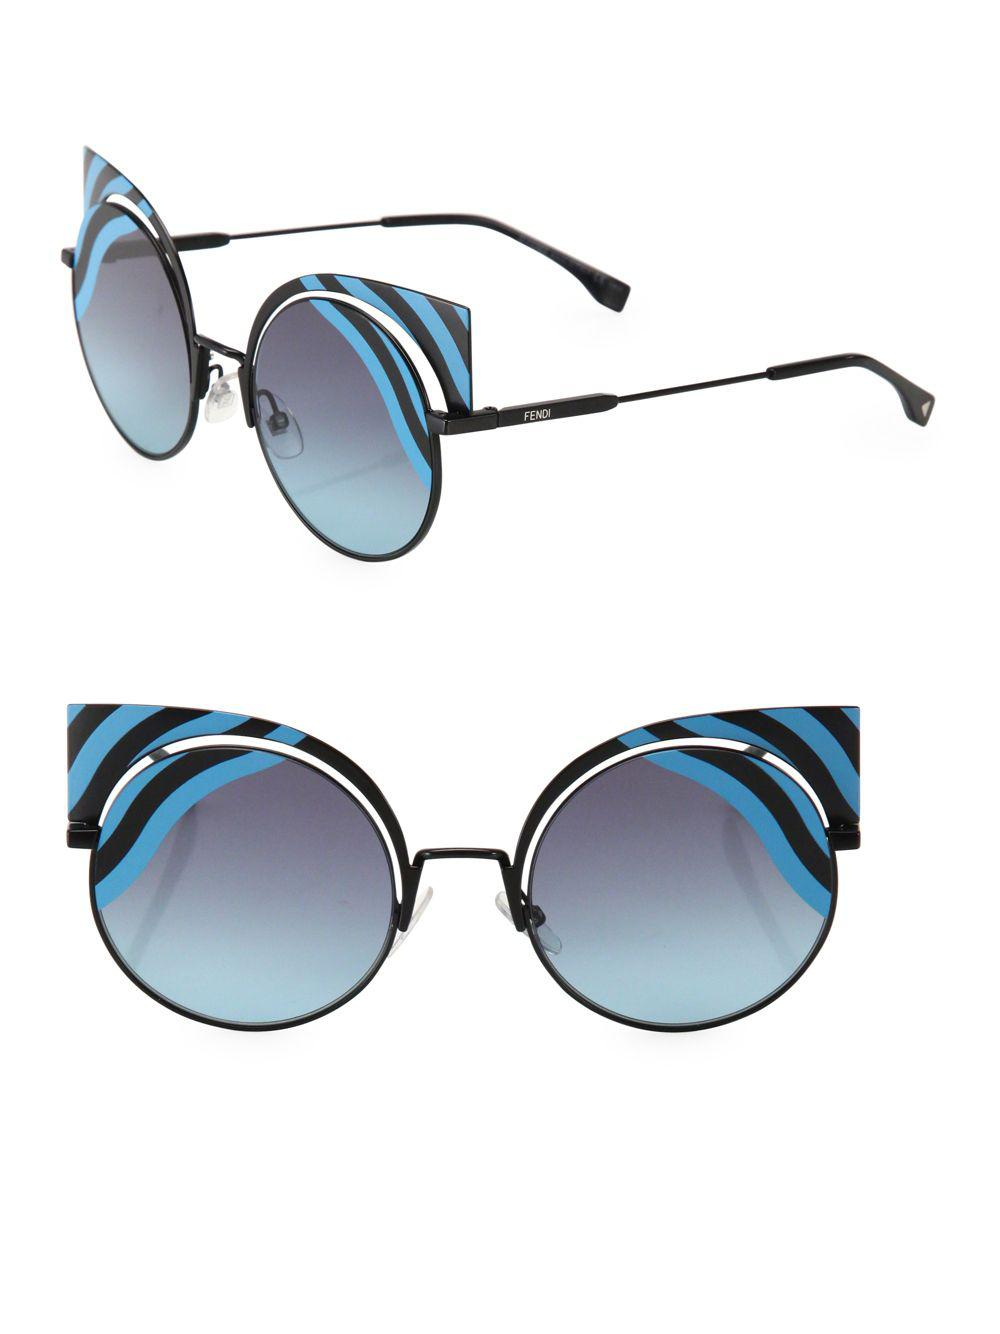 0f6478e049c Fendi - Blue 42mm Rounded Cat Eye Sunglasses - Lyst. View fullscreen